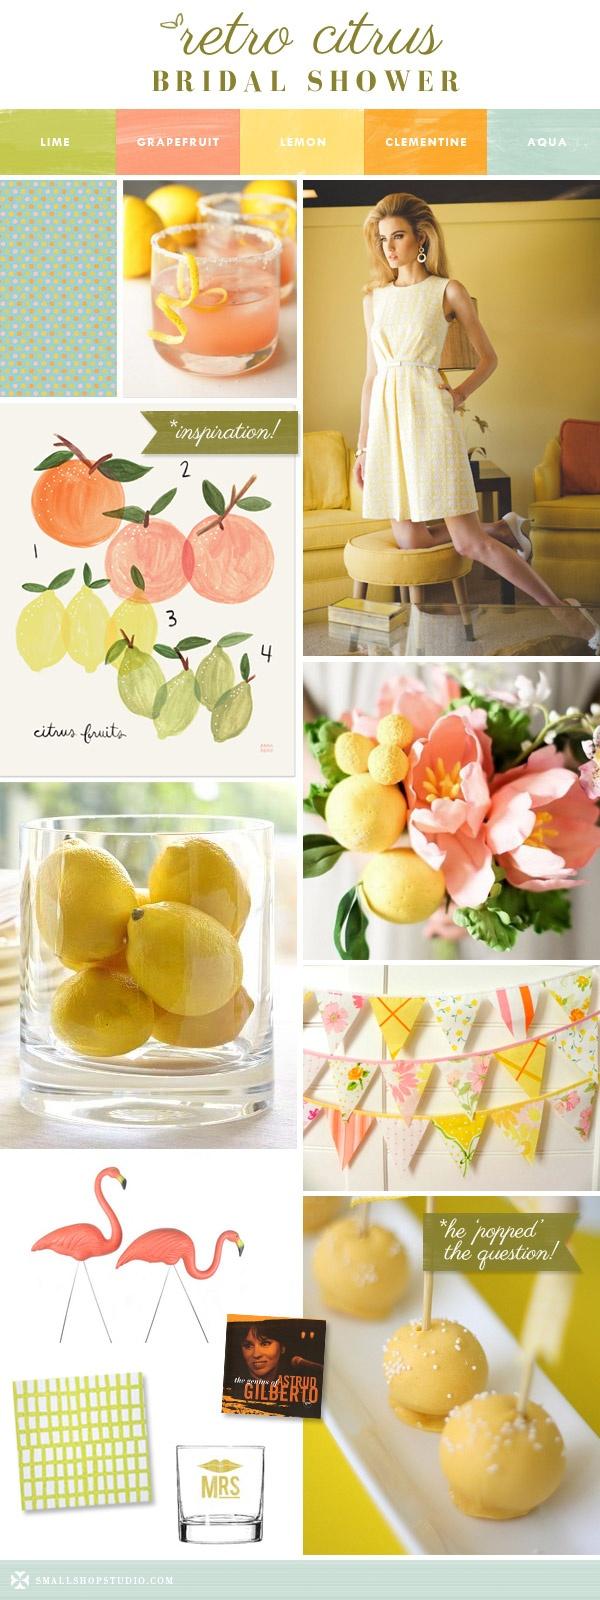 retro citrus bridal shower, lime, grapefruit, lemon, orange, aqua, cocktail party, Trina Turk, 60's, mod, vintage, fabric garland, coral flowers, flamingos, Bossa Nova, cake pops, green, yellow